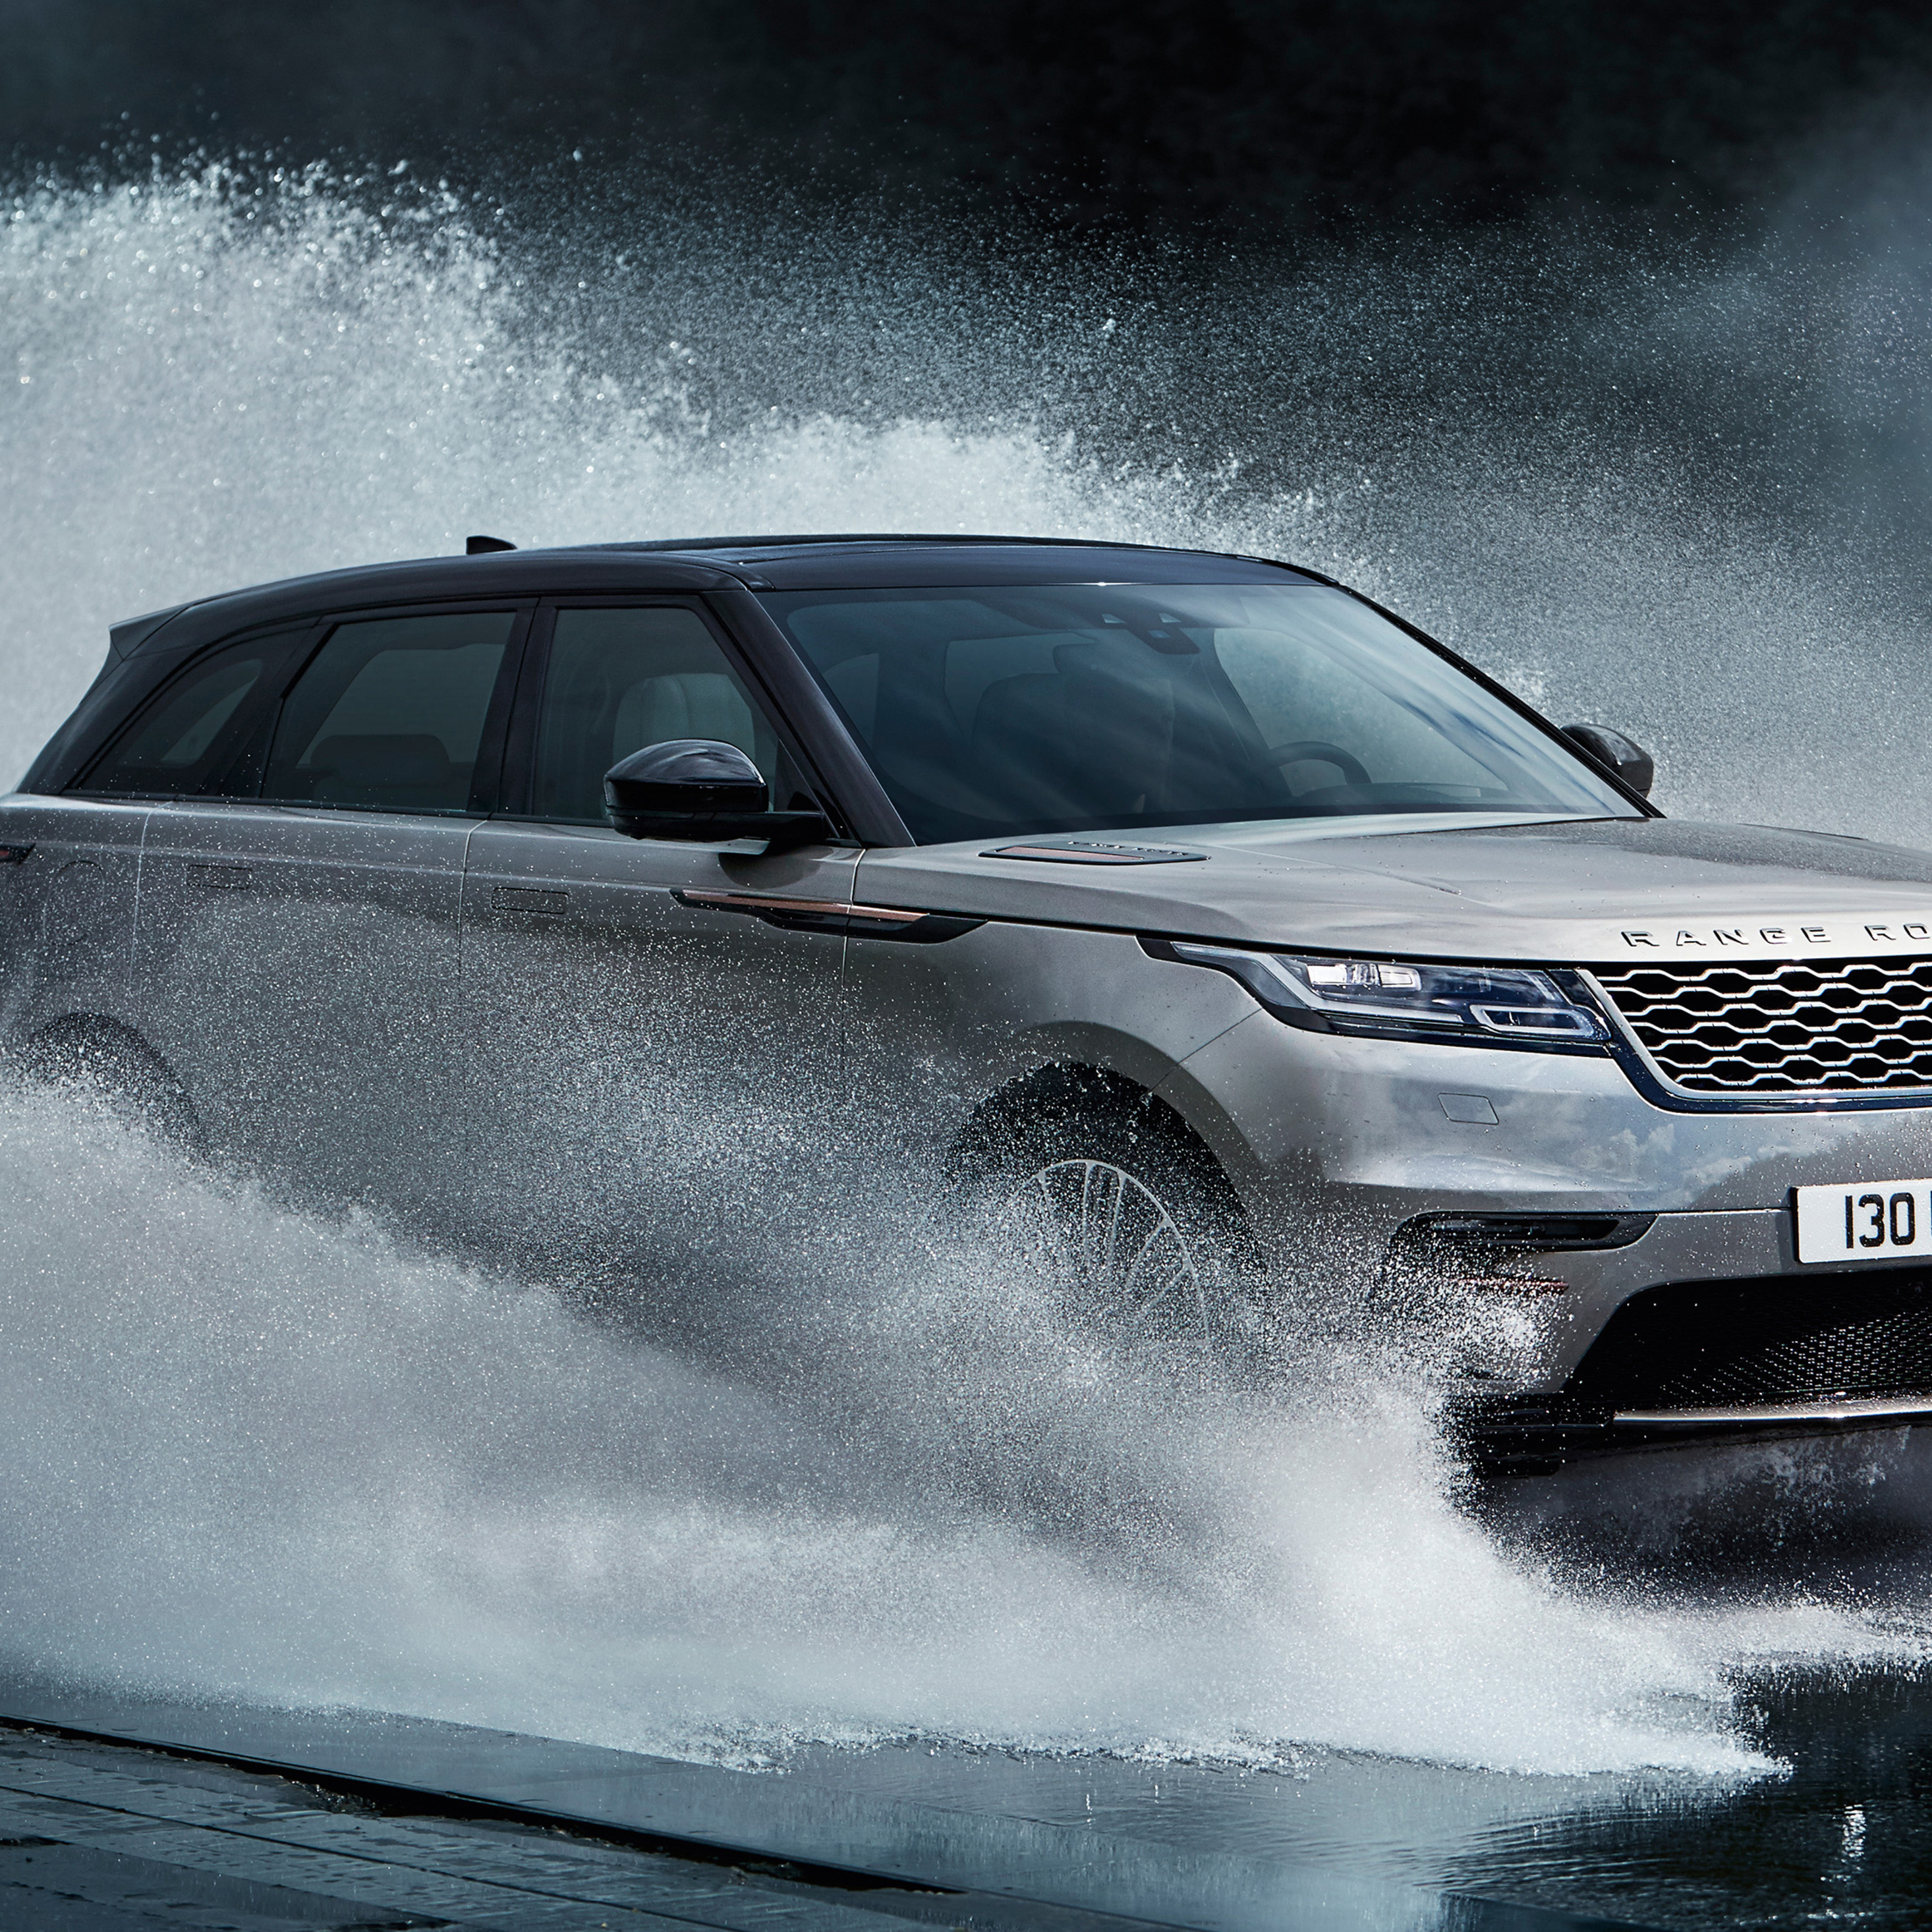 Land Rover Car Wallpaper: 2932x2932 Range Rover Velar 2018 4k Ipad Pro Retina